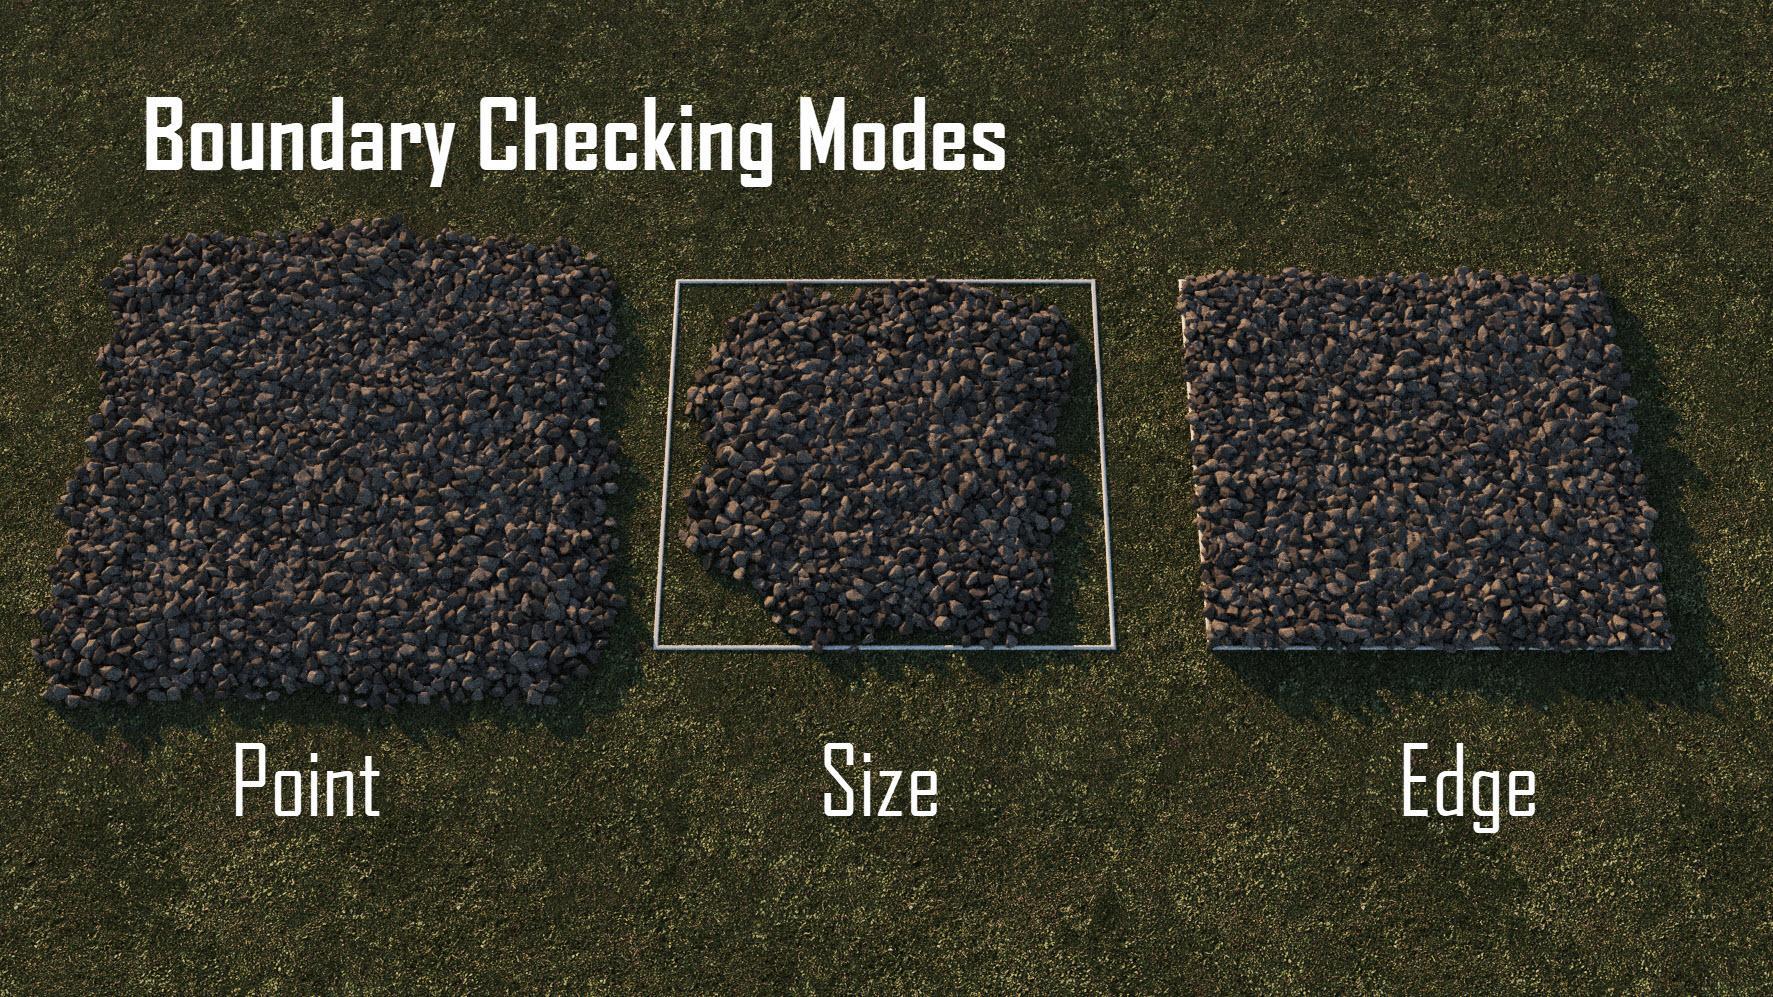 Edge Mode Settings